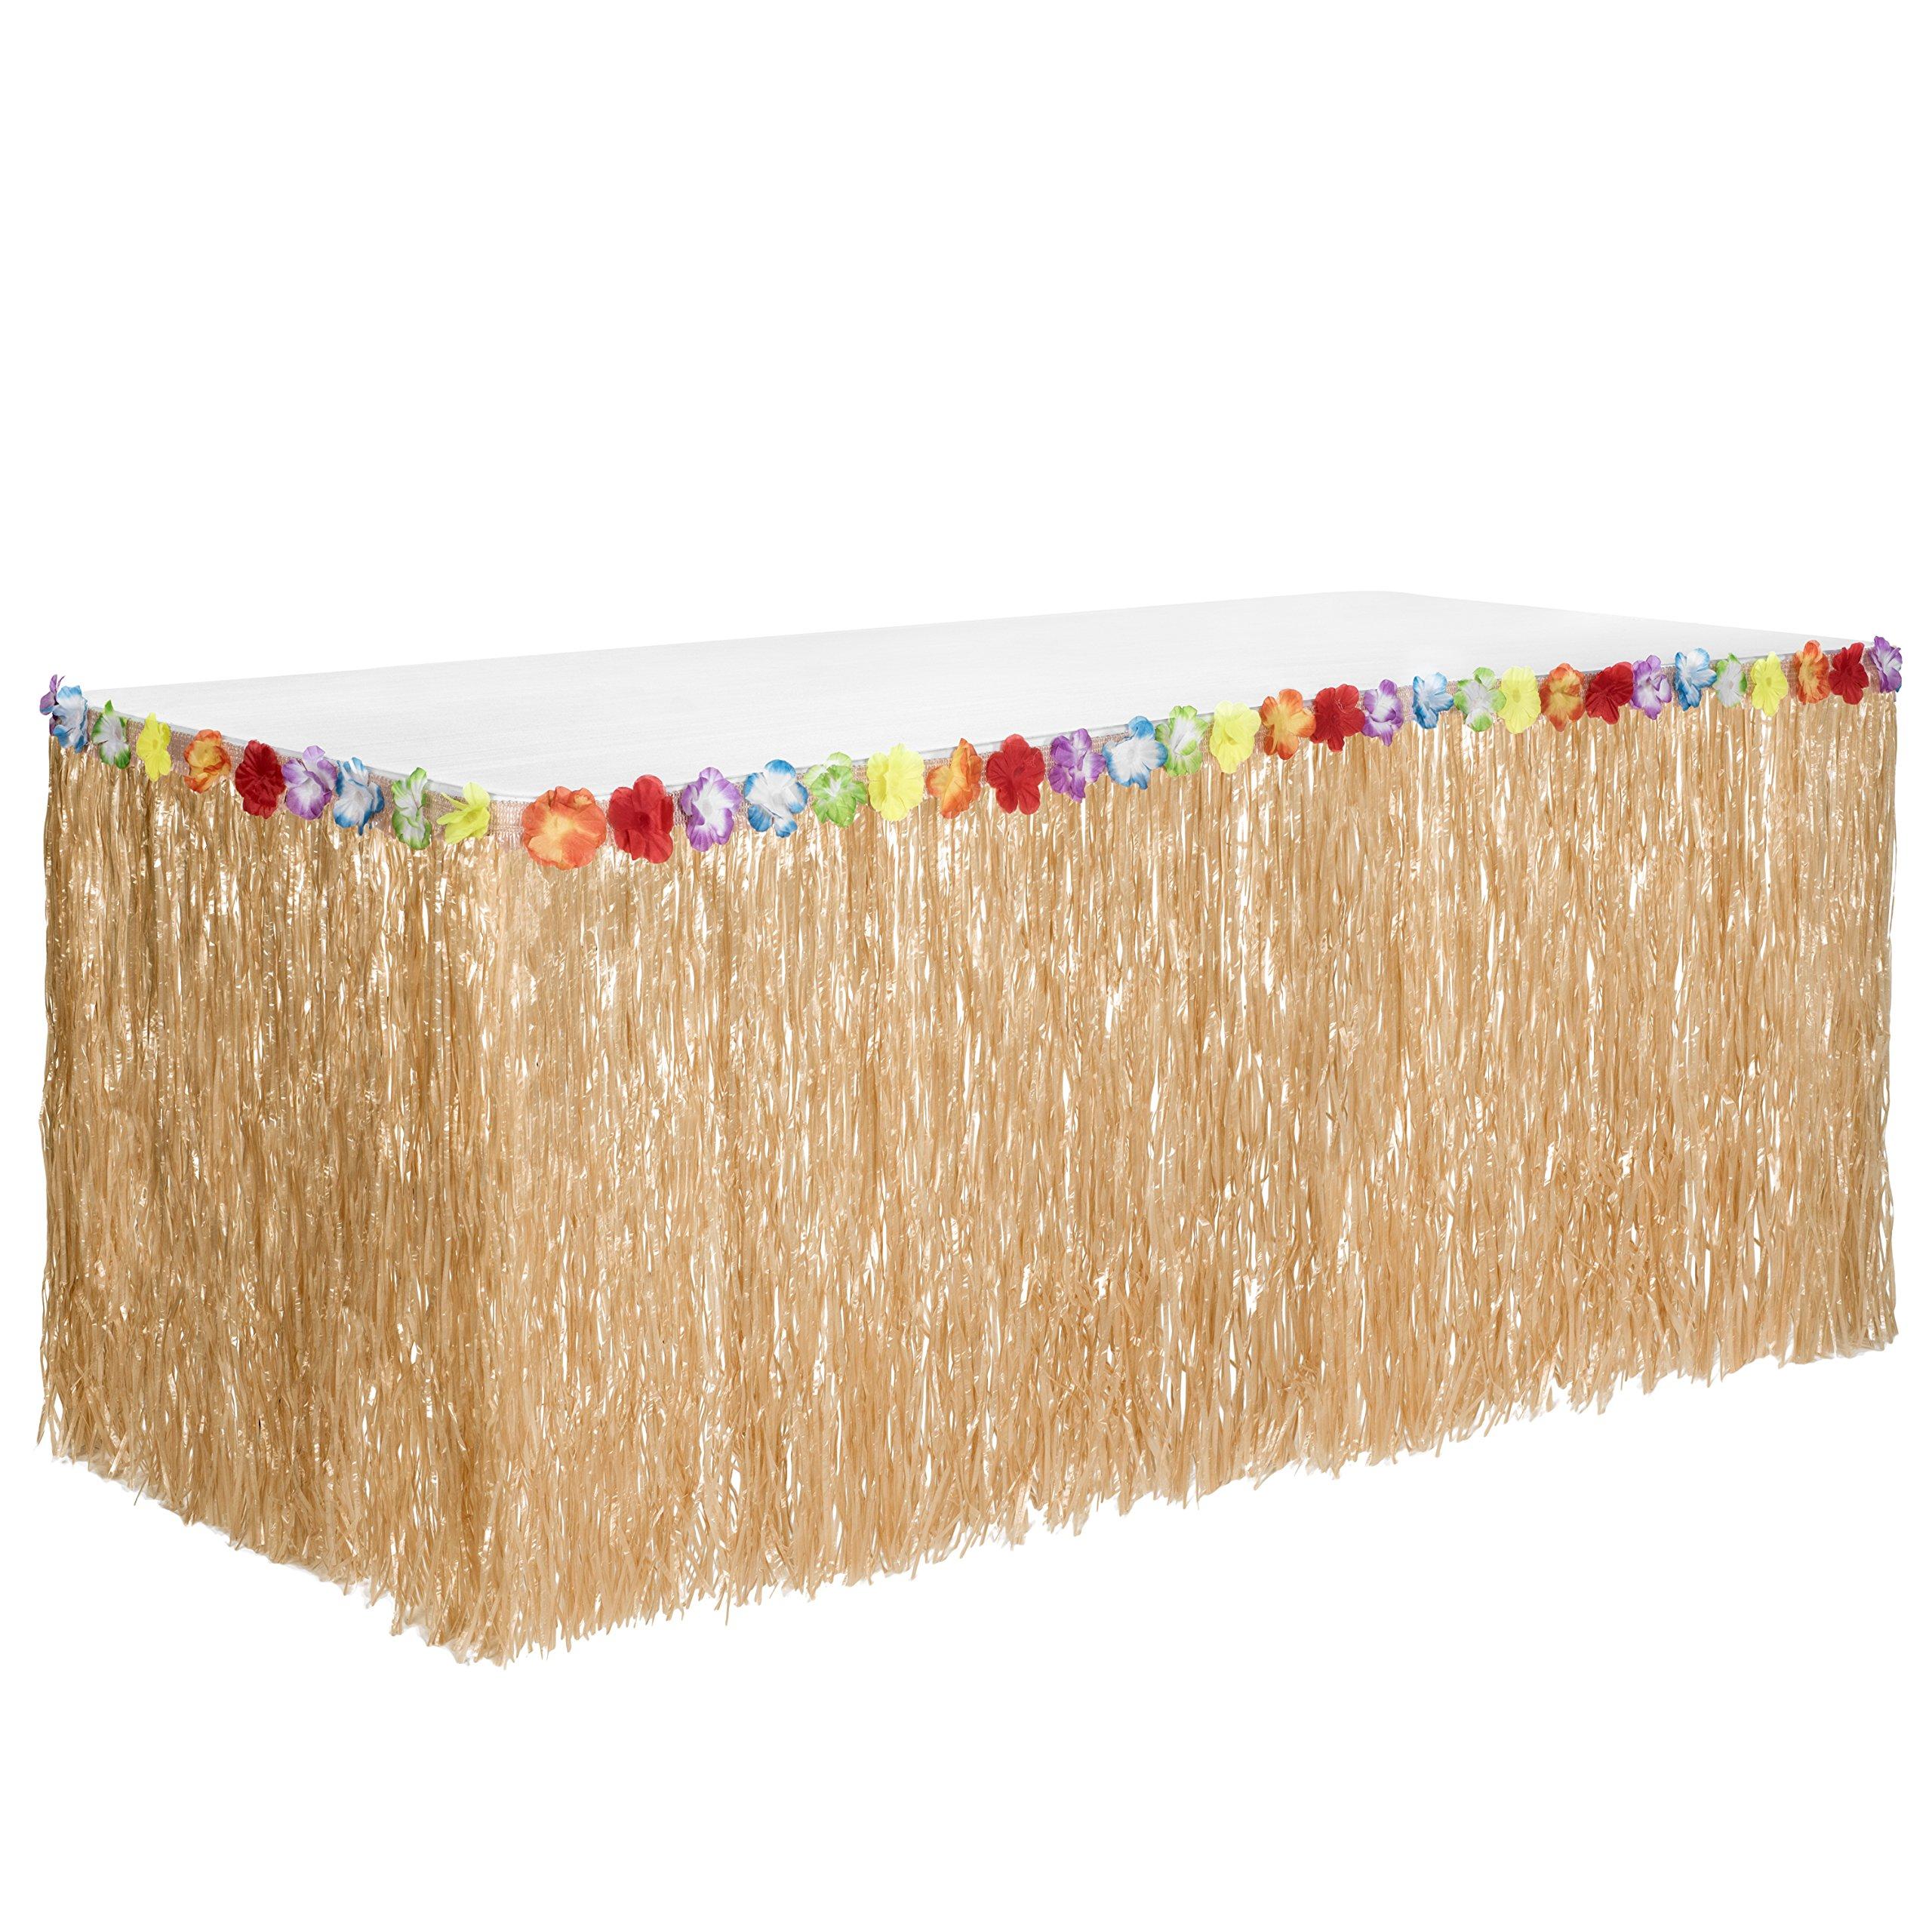 Hawaiian Luau Grass Table Skirt: BONUS 12 Hibiscus Flowers | Includes Adhesive | Perfect Beach, Tiki, Tropical, Island, Party, Luau Decoration 9ft by Luau Essentials (Image #7)